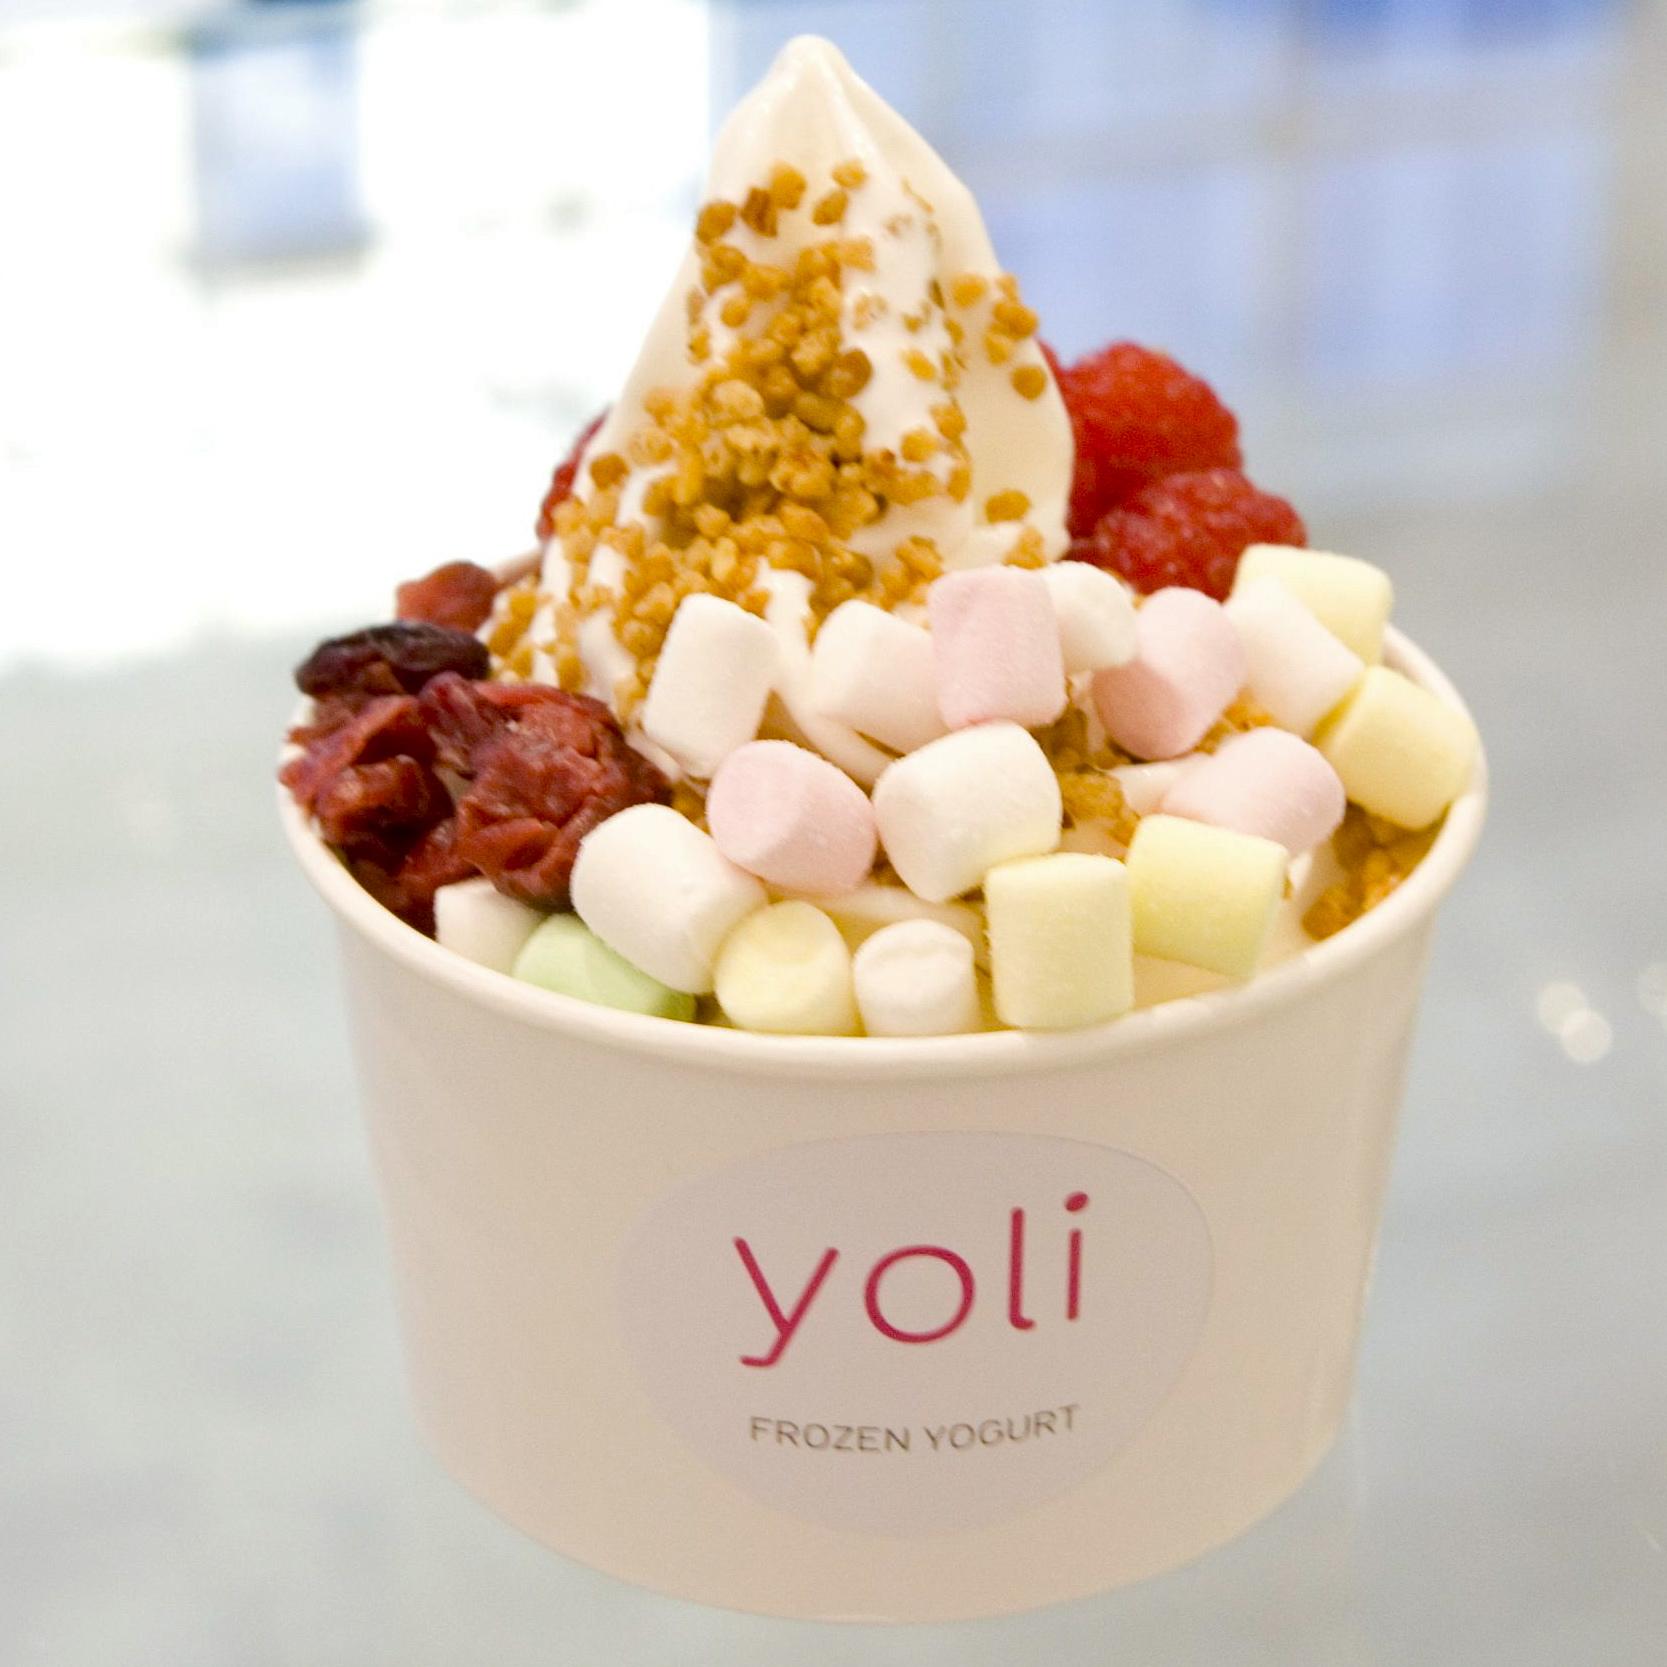 Yoli-Frozen-Yogurt